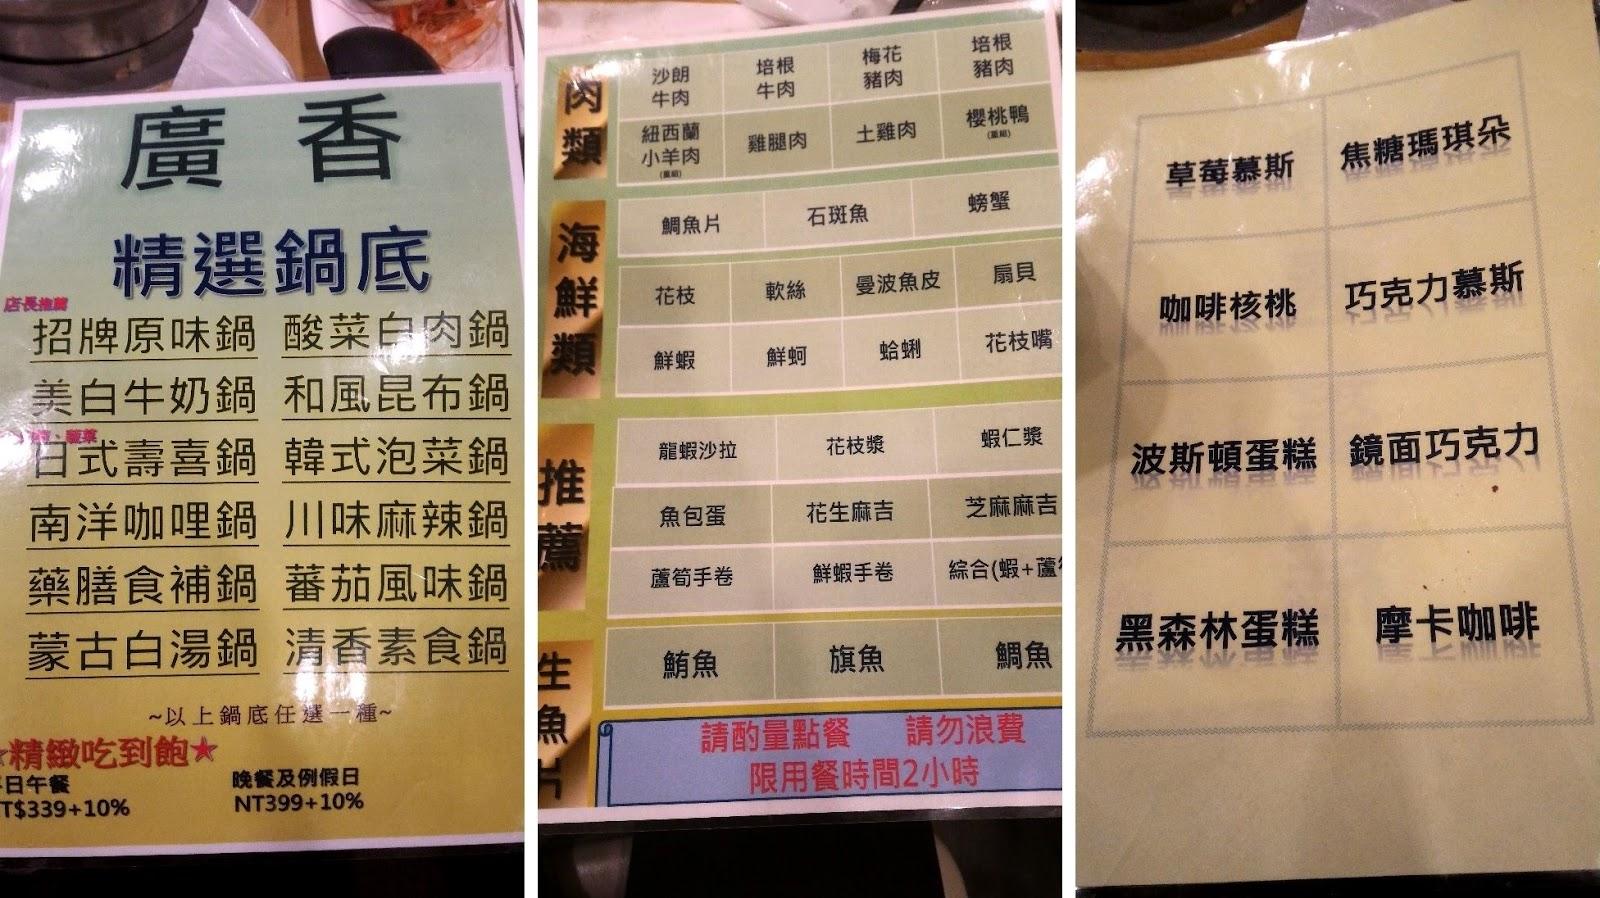 P 20160725 194029 - [食記] 廣香吃到飽日式涮涮鍋,超多種飲料、冰品及甜點!